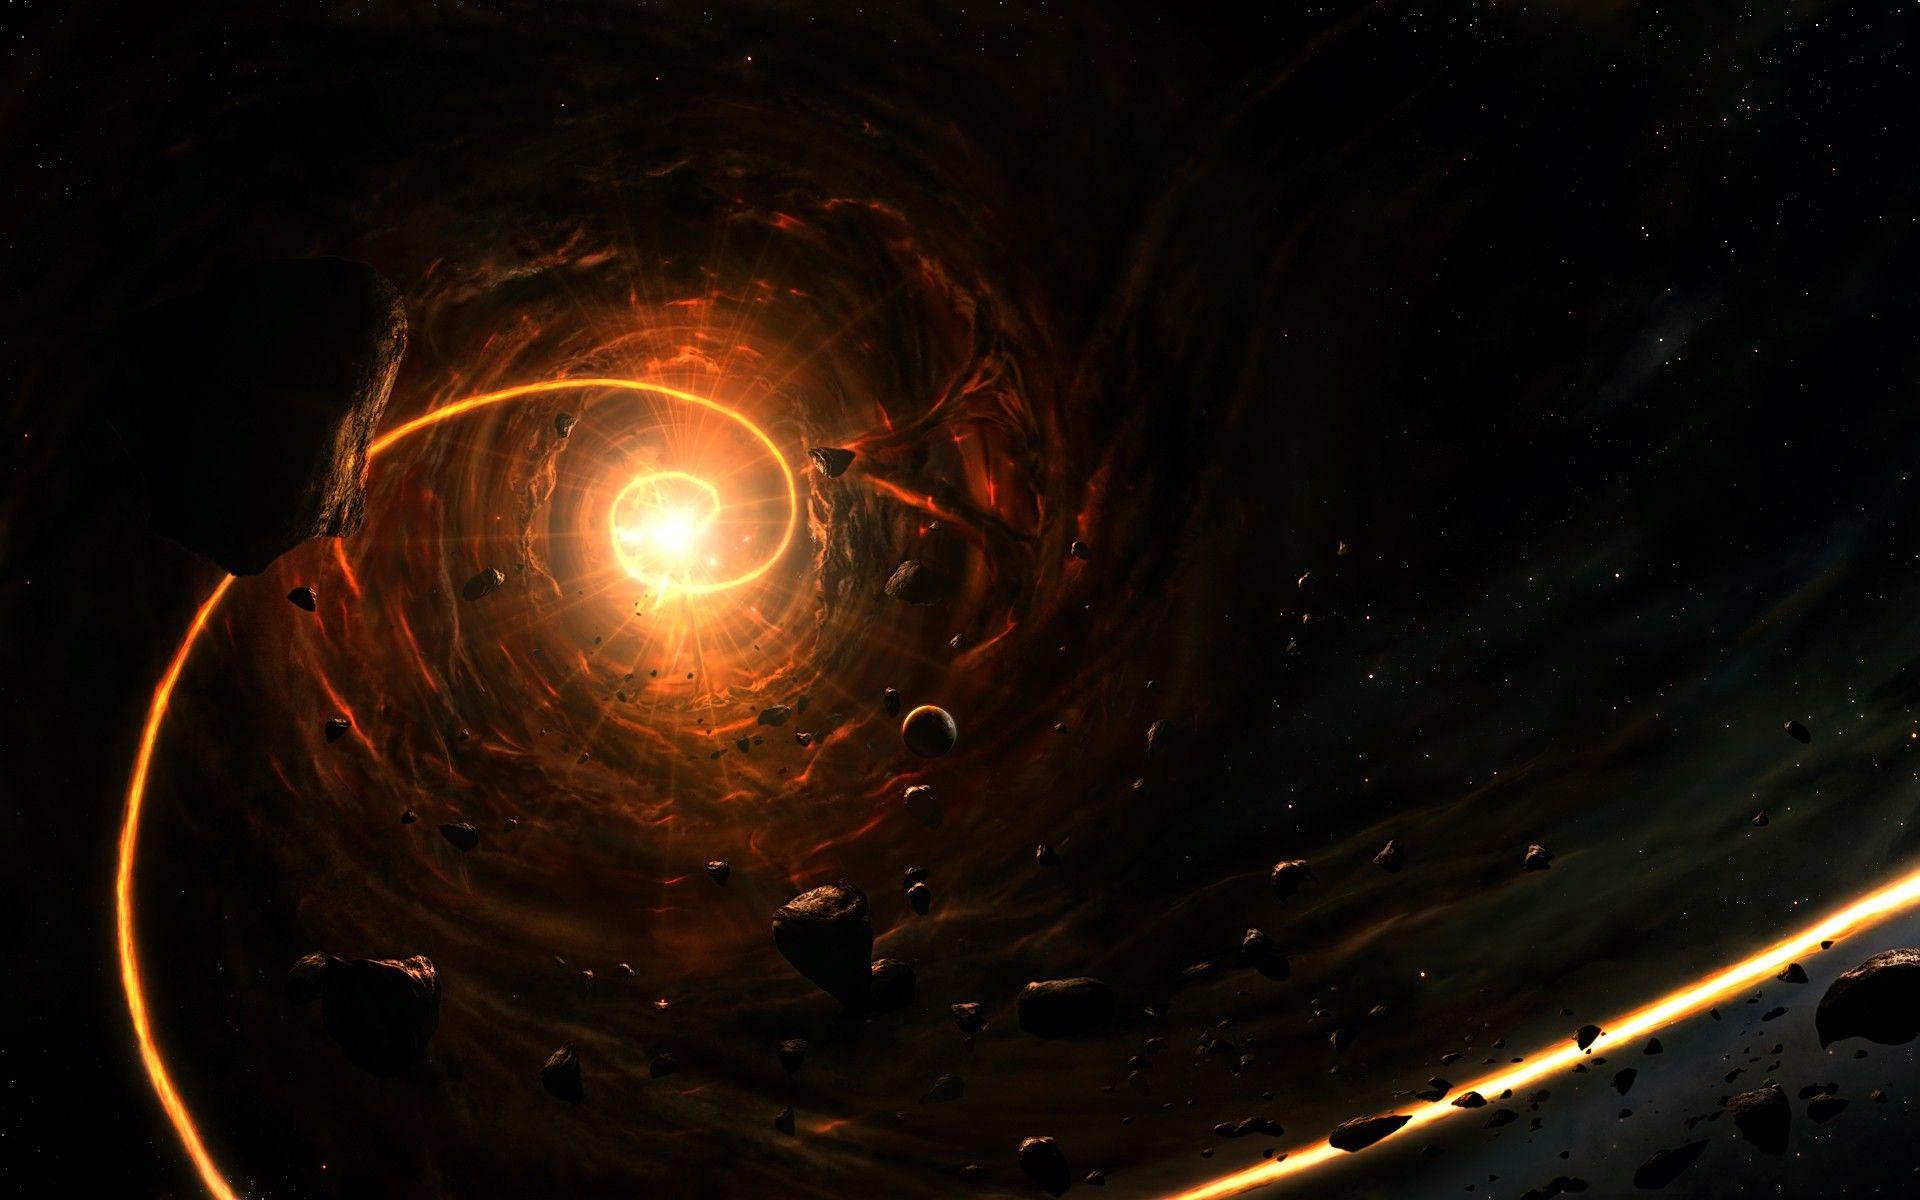 Interstellar Gargantua 4k Space Wallpapers Hd Wallpapers Digital Universe Wallpapers Digital Art Wallpa Black Hole Wallpaper Interstellar Interstellar Movie